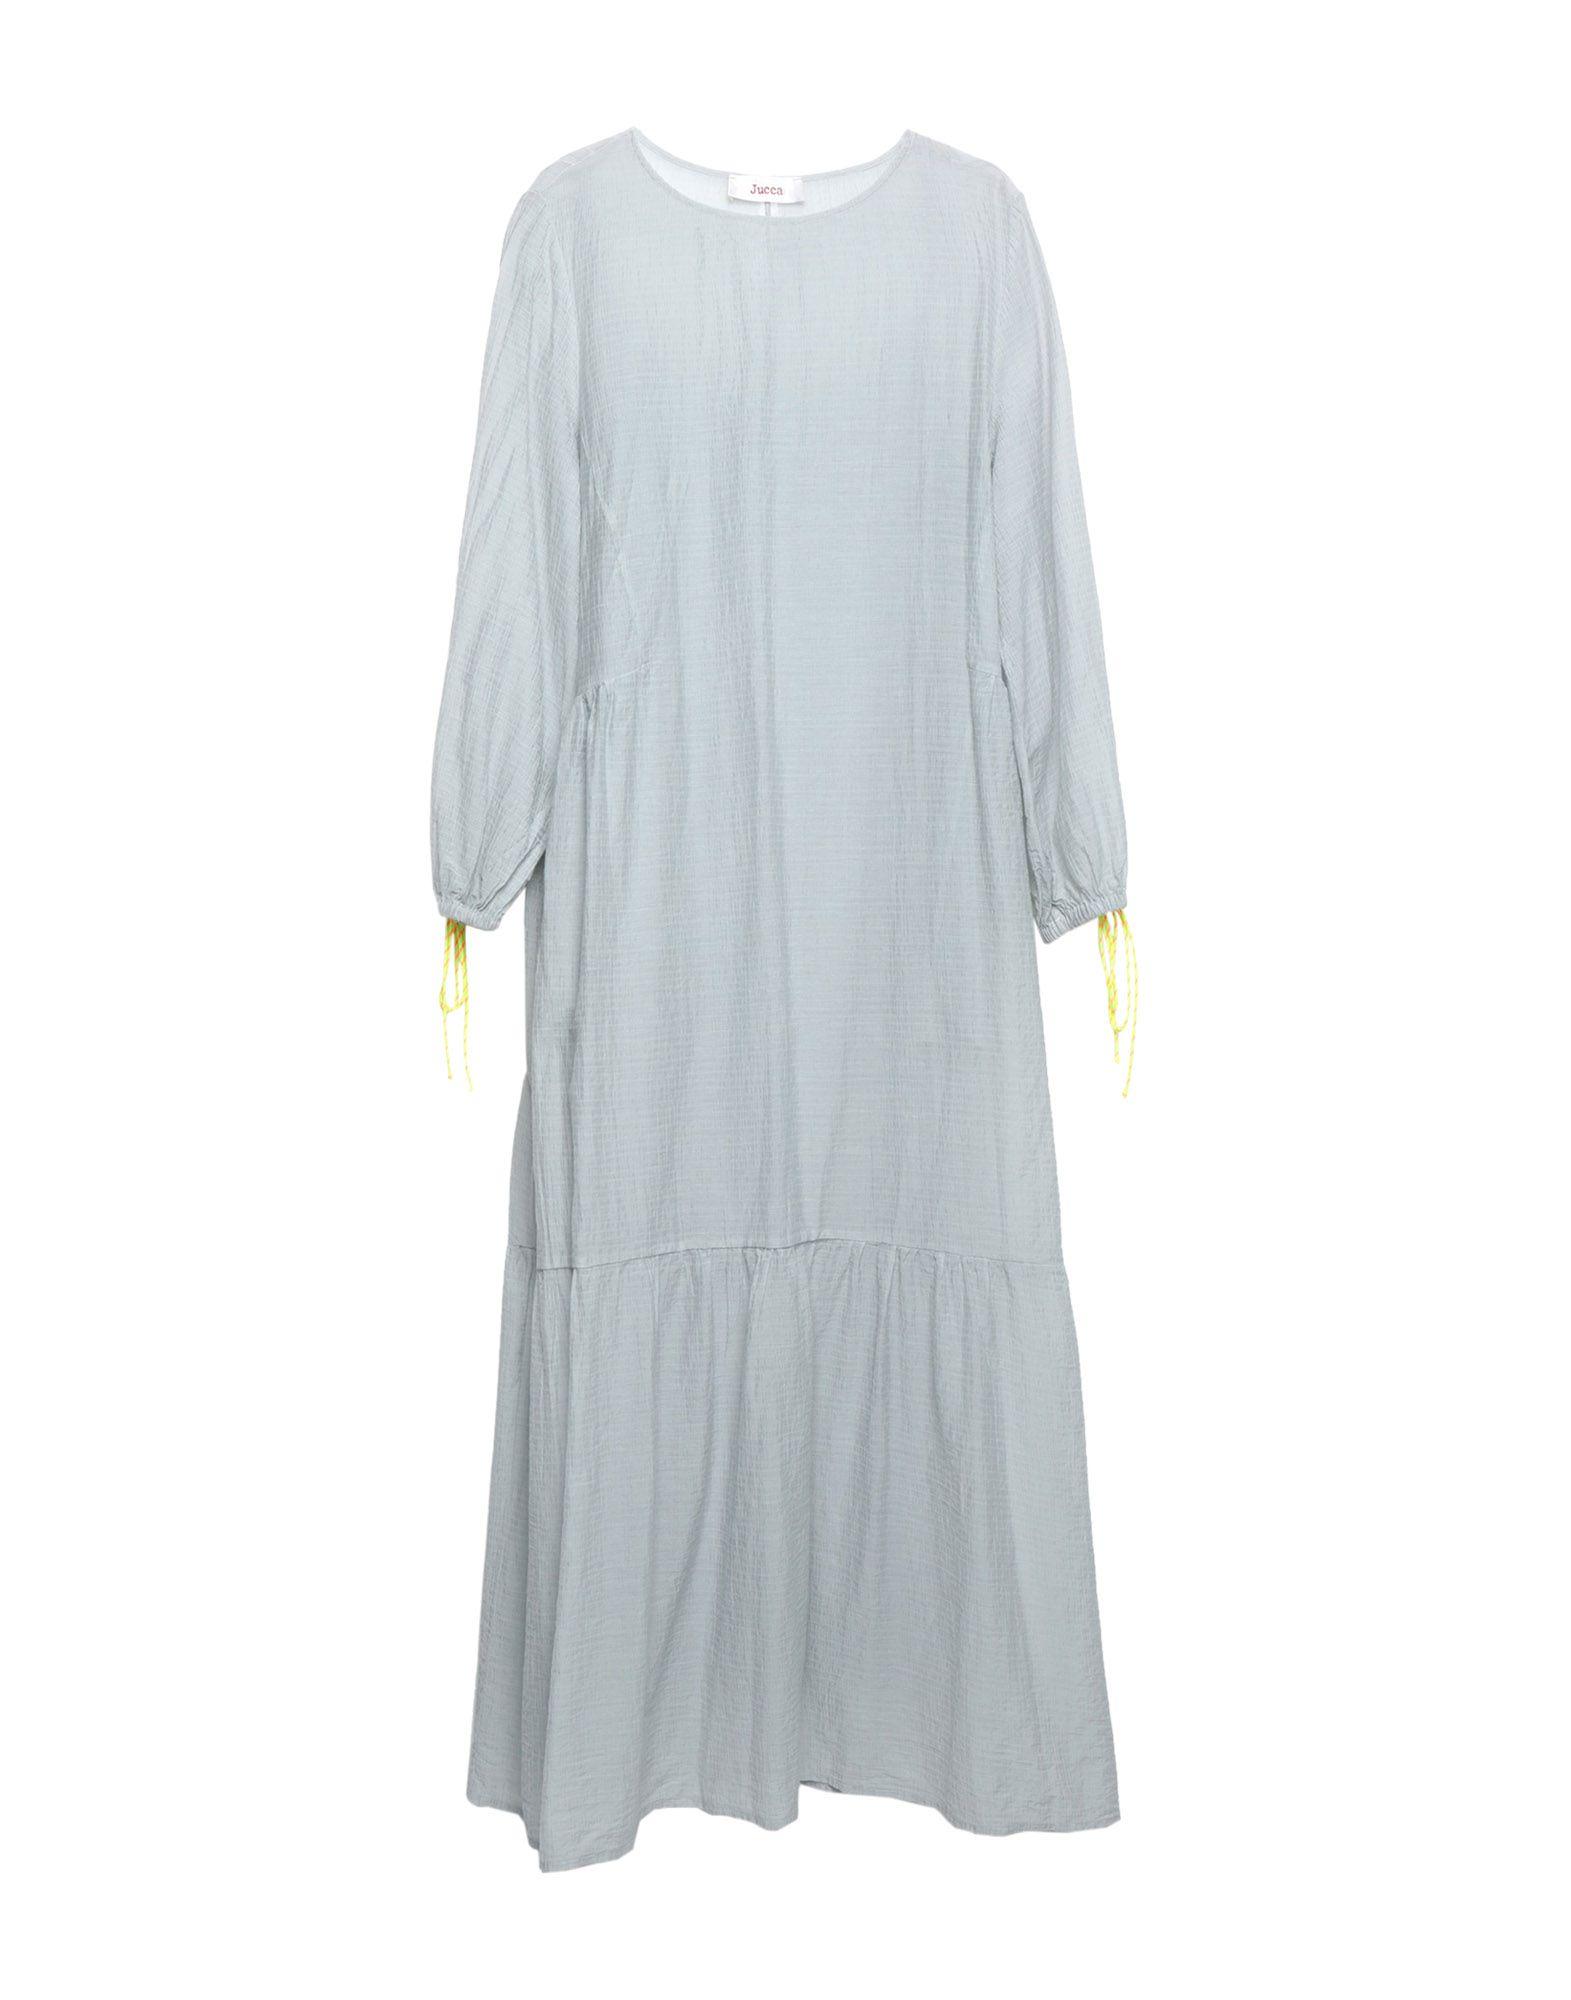 JUCCA Платье длиной 3/4 icons платье длиной 3 4